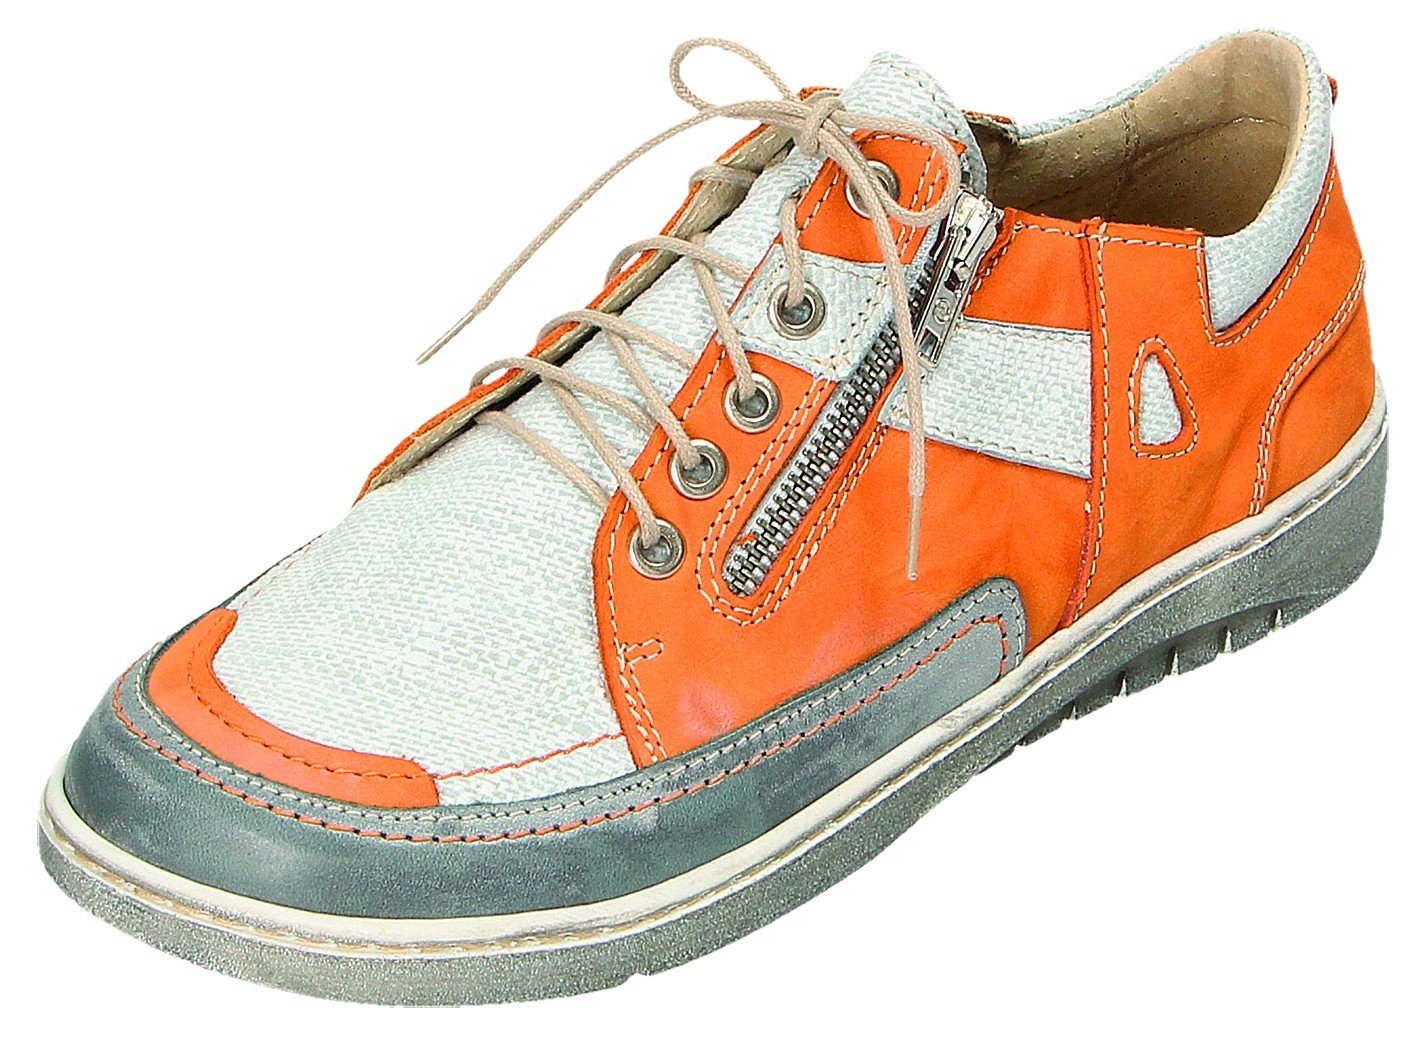 MICCOS Zapatos de Cordones Para Mujer Naranja Orange/Komb. 40 EU orange/komb.